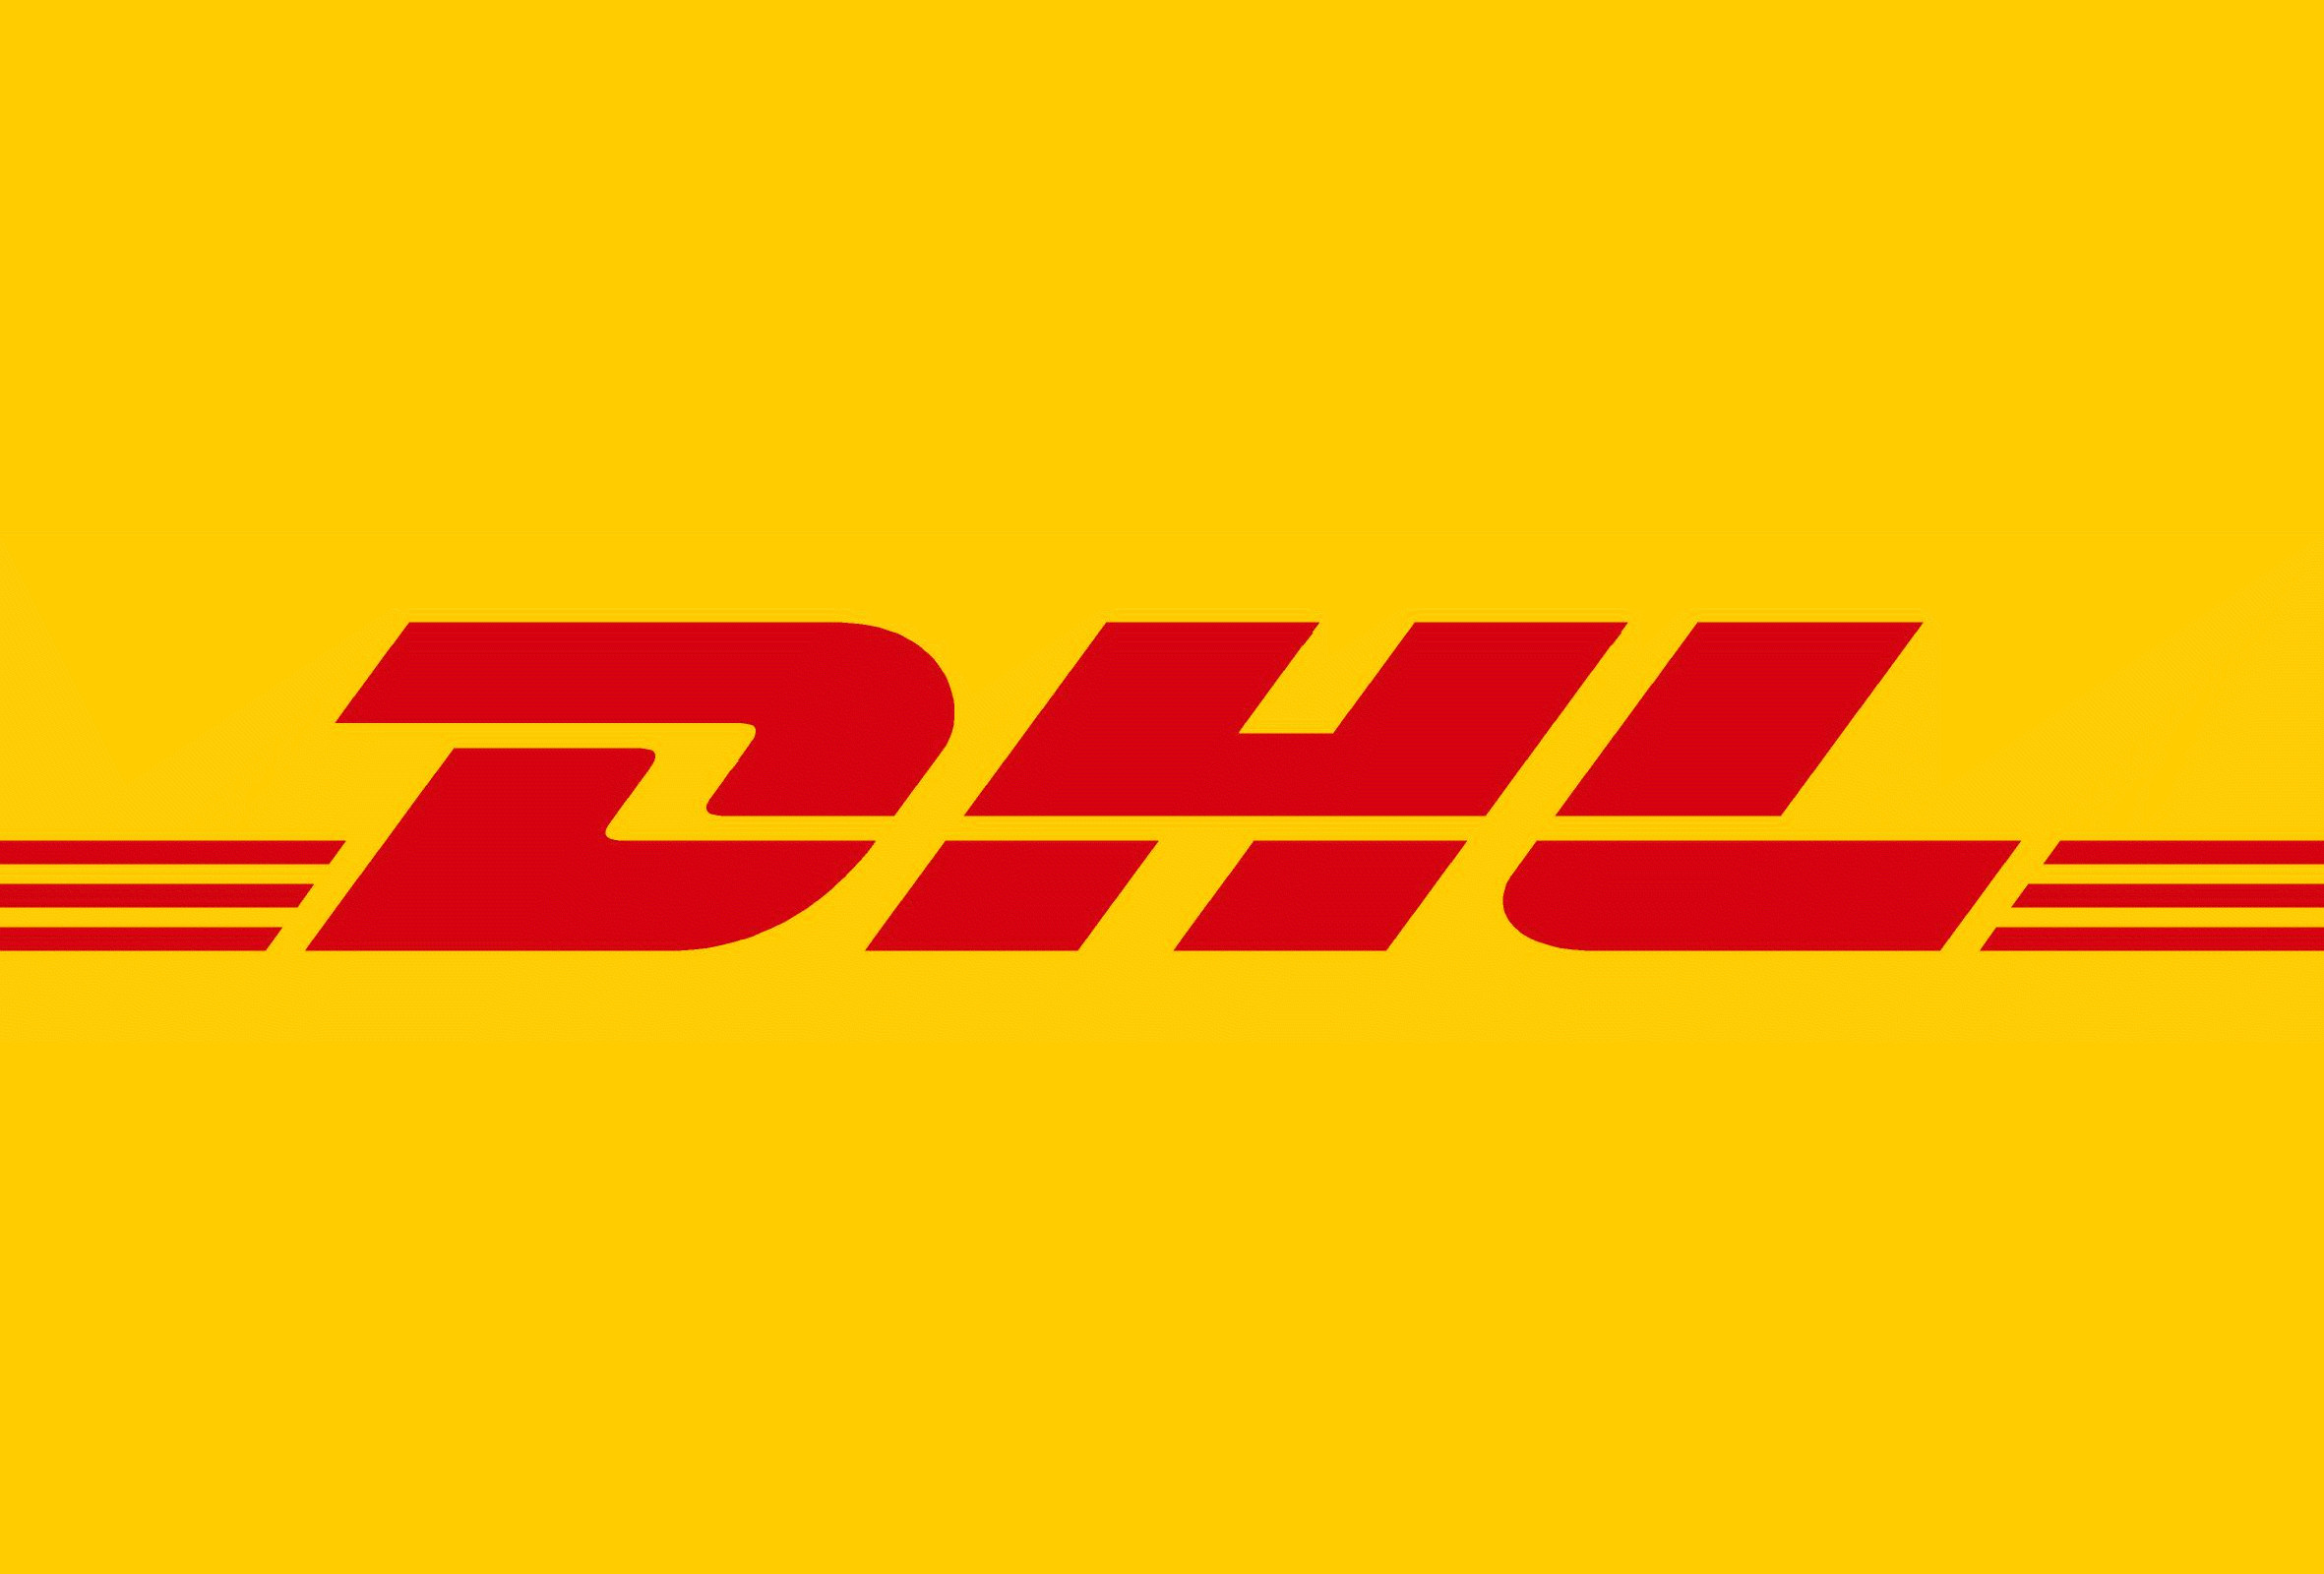 94e975bf9b1a18 DHL investiert in Südostasien